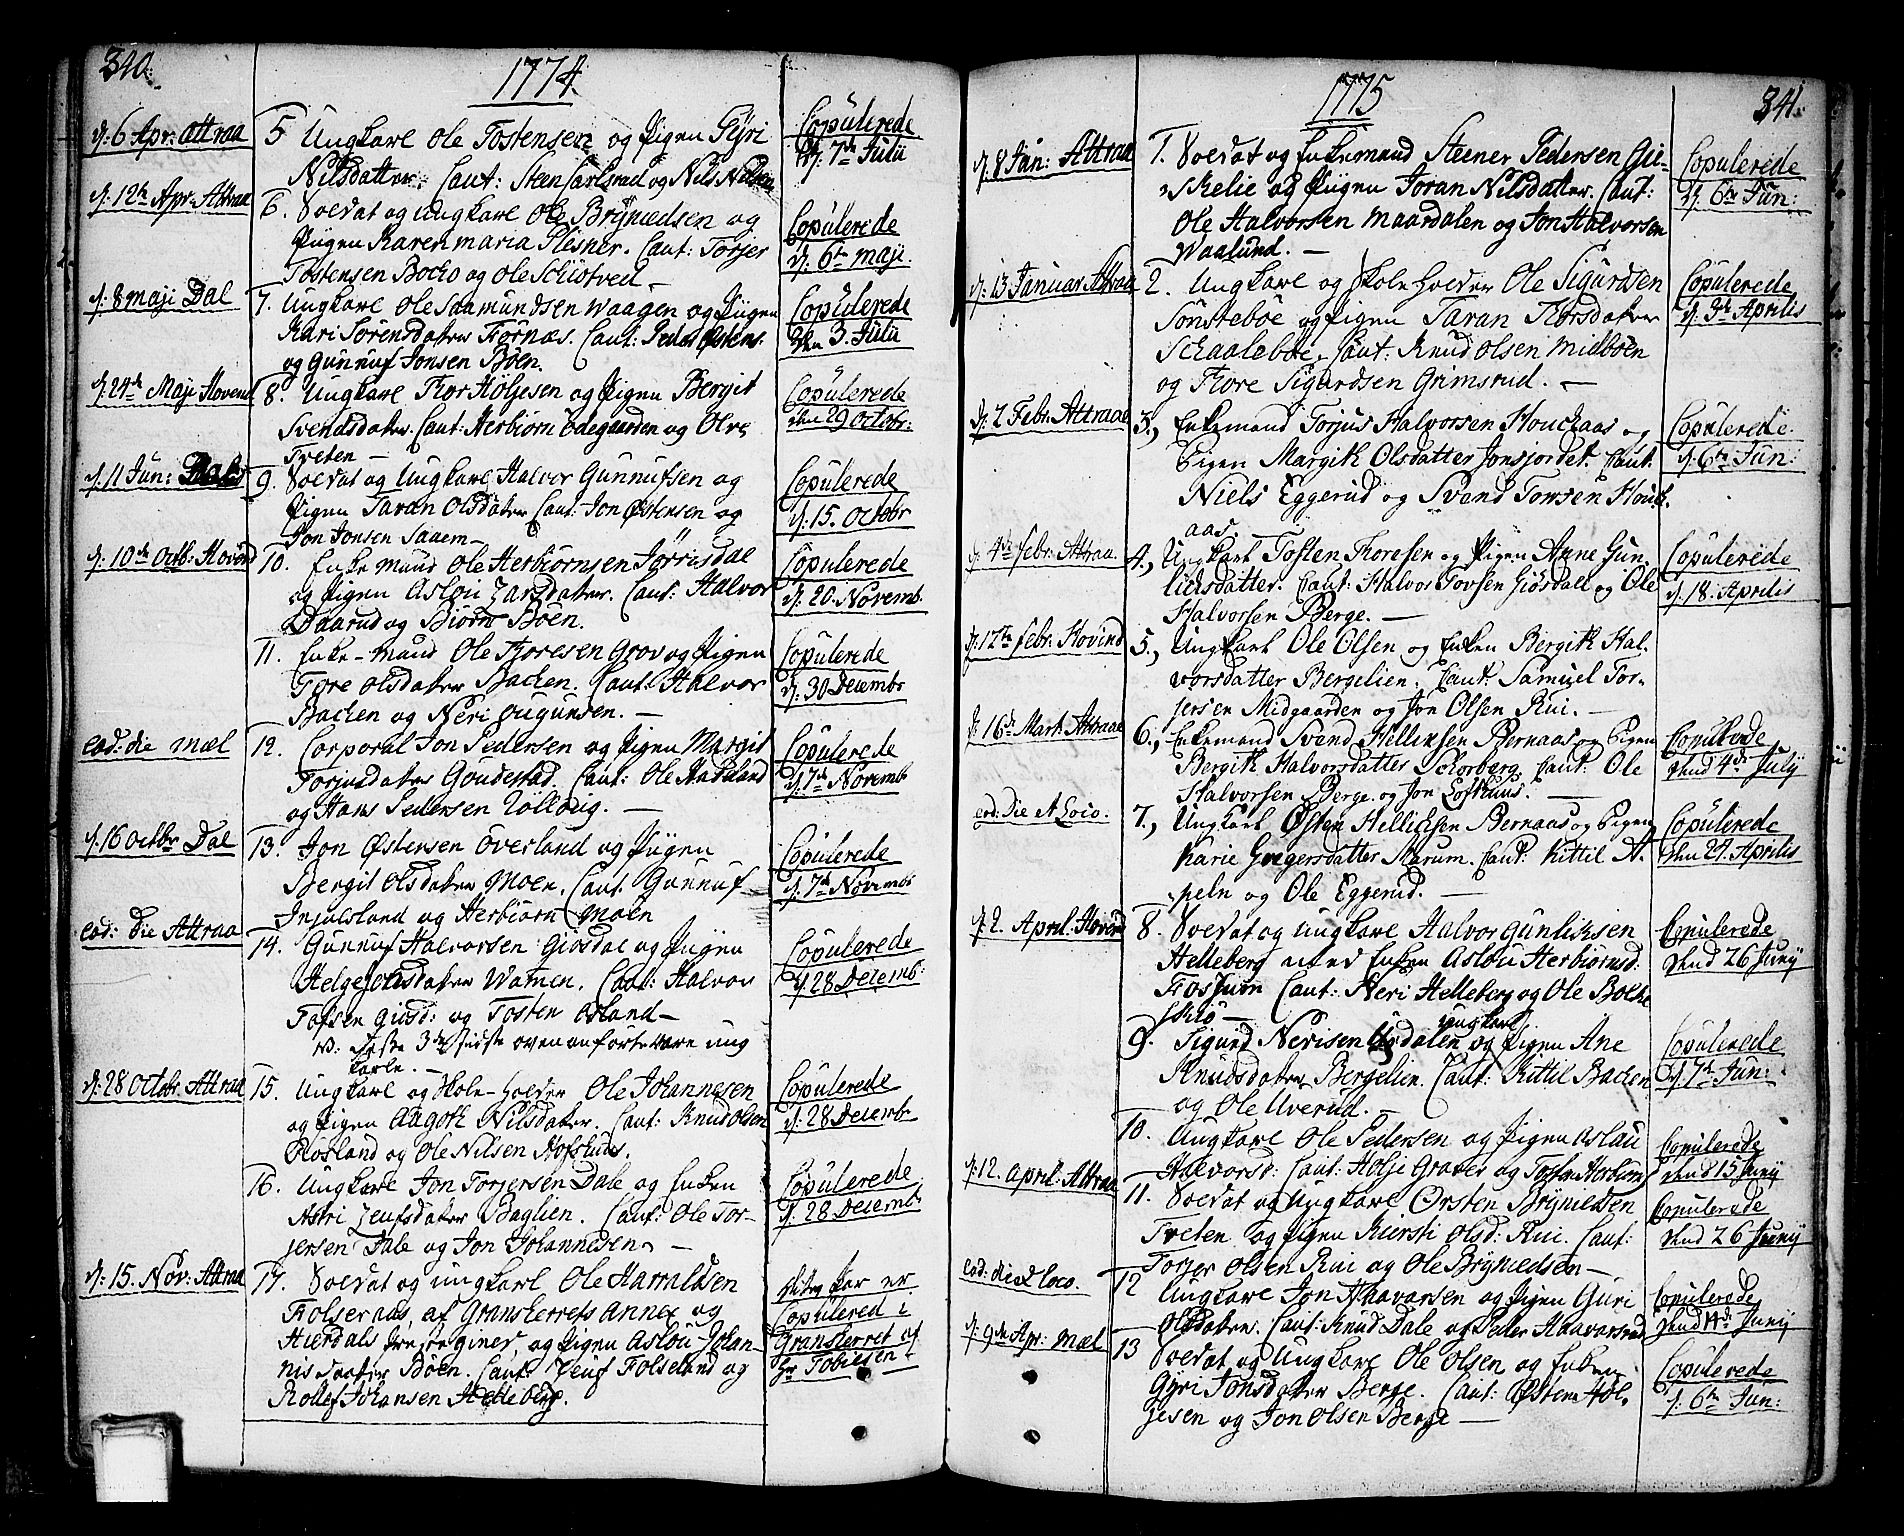 SAKO, Tinn kirkebøker, F/Fa/L0002: Ministerialbok nr. I 2, 1757-1810, s. 340-341